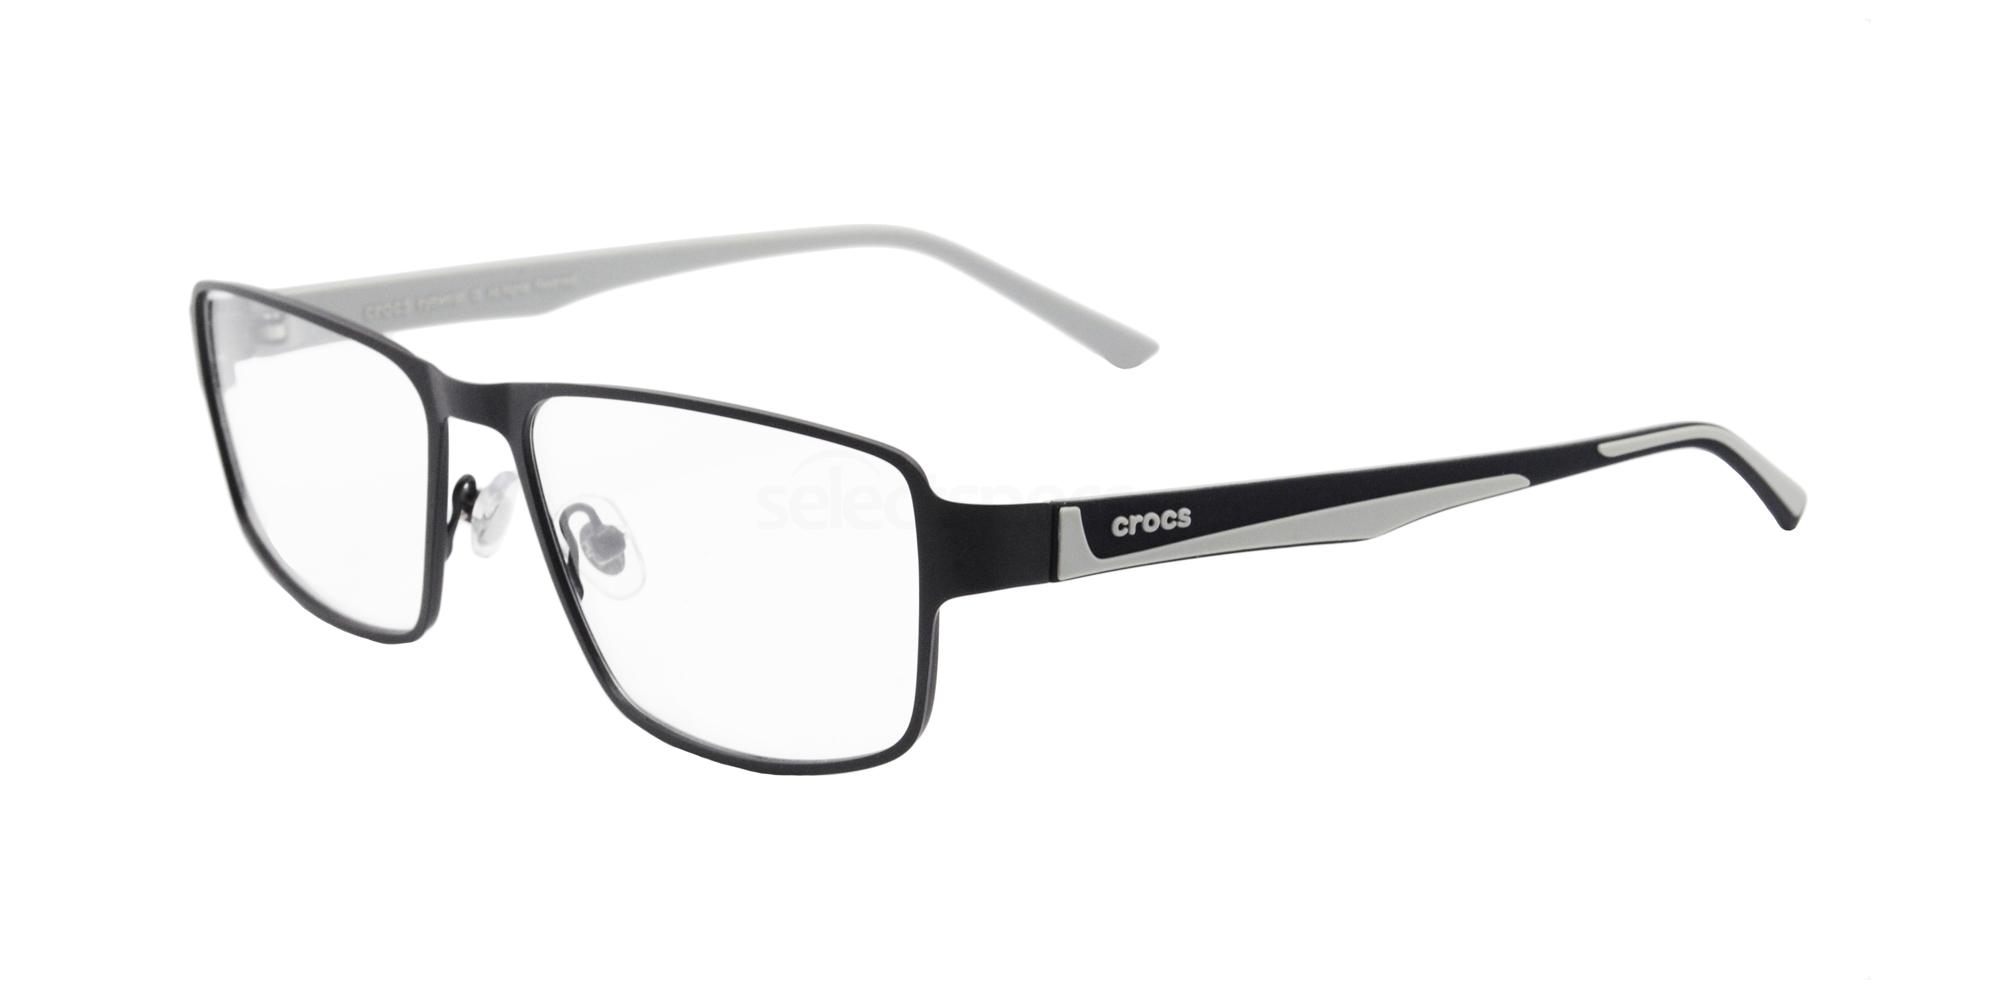 20GY CF3010 Glasses, Crocs Eyewear